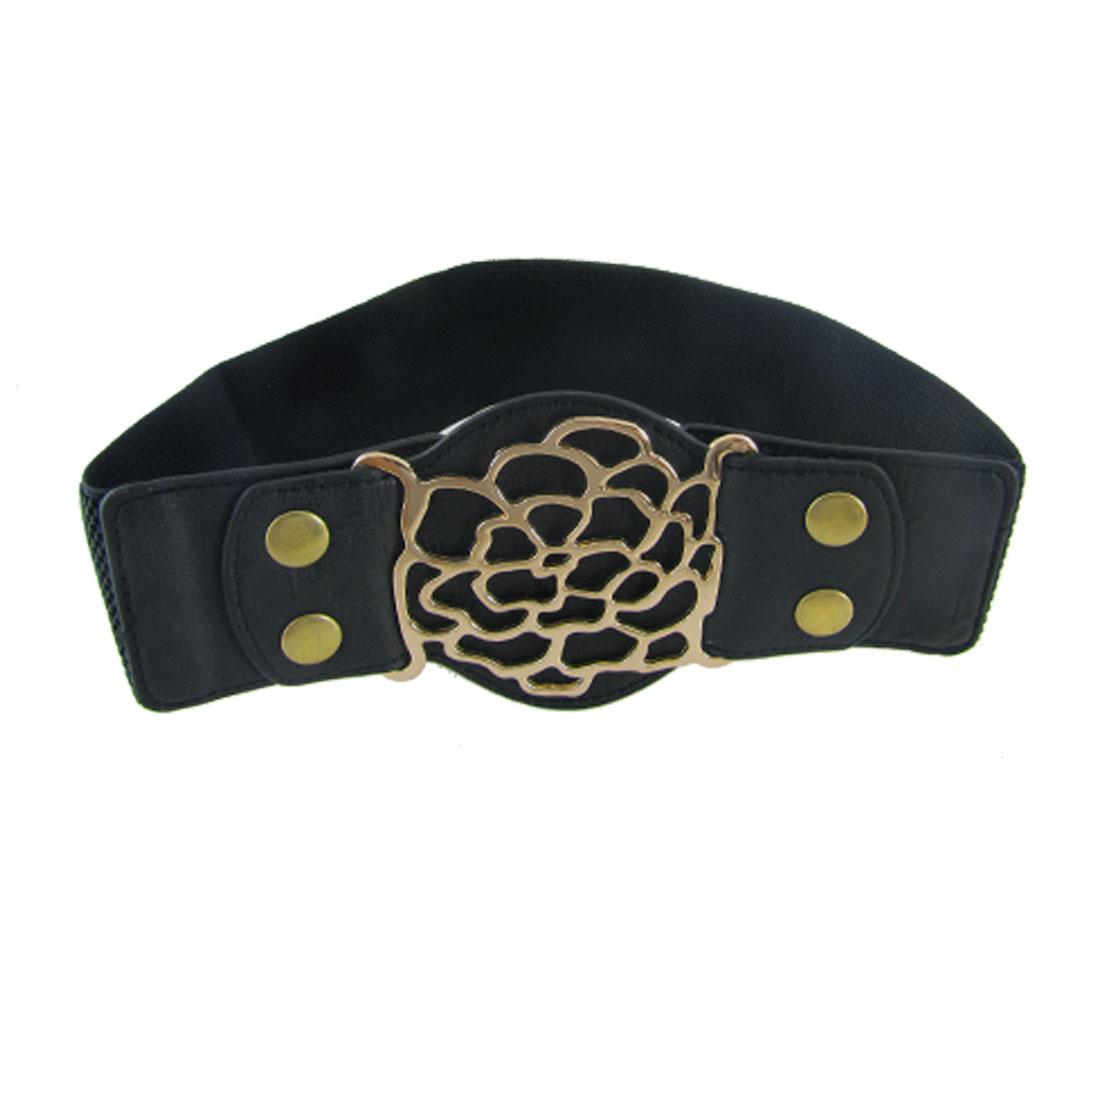 Woman Hollowed Metal Buckle Press Stud Fasteners Black Textured Stretch Cinch Belt